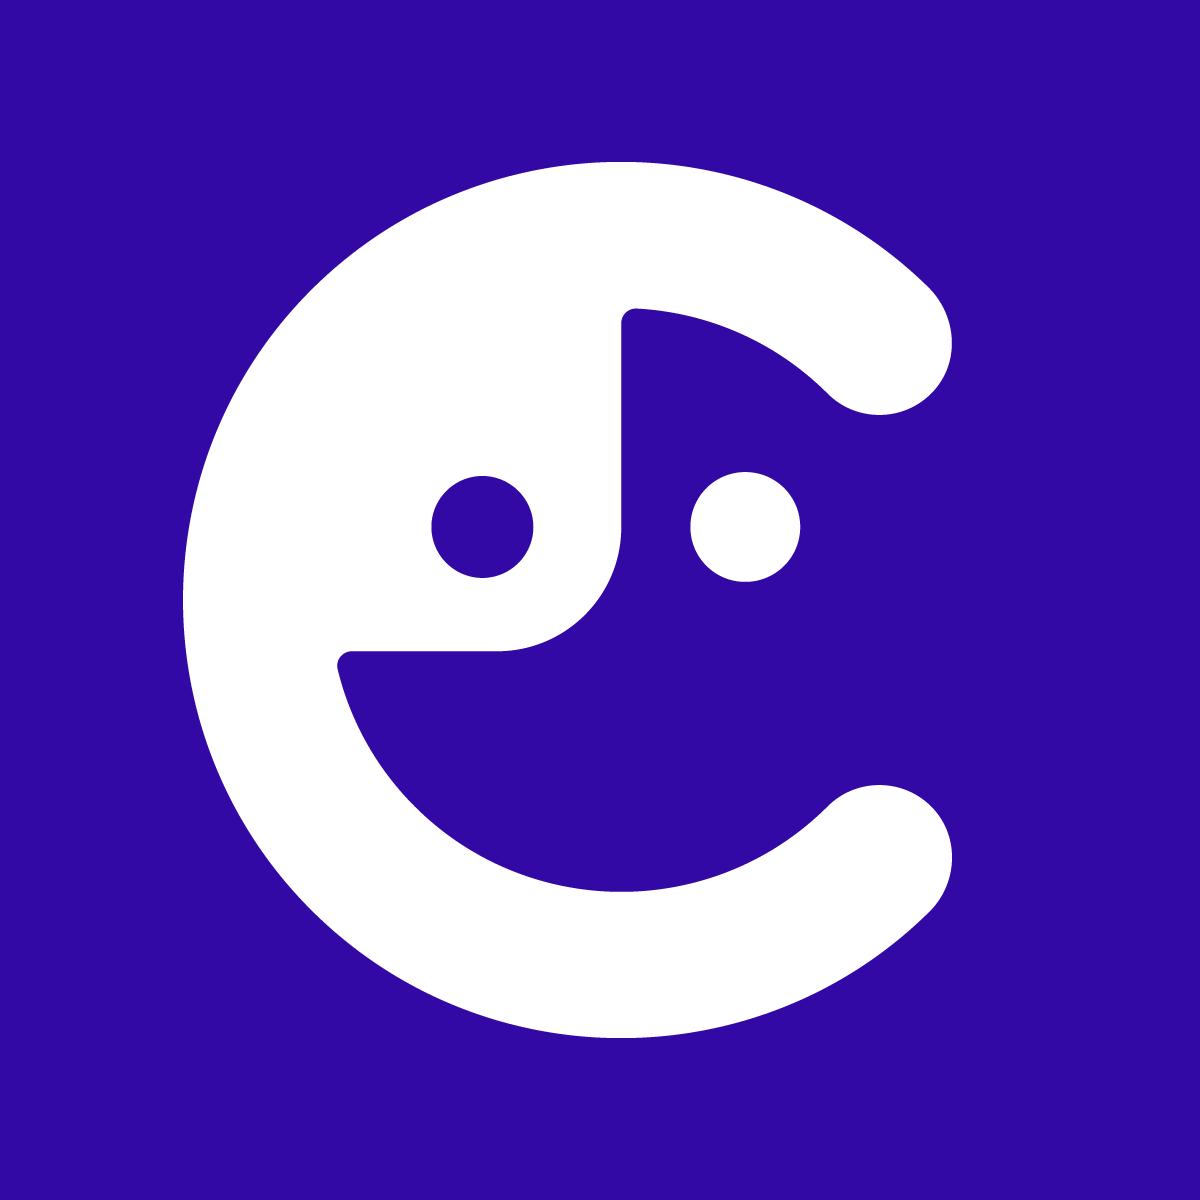 Comity logo